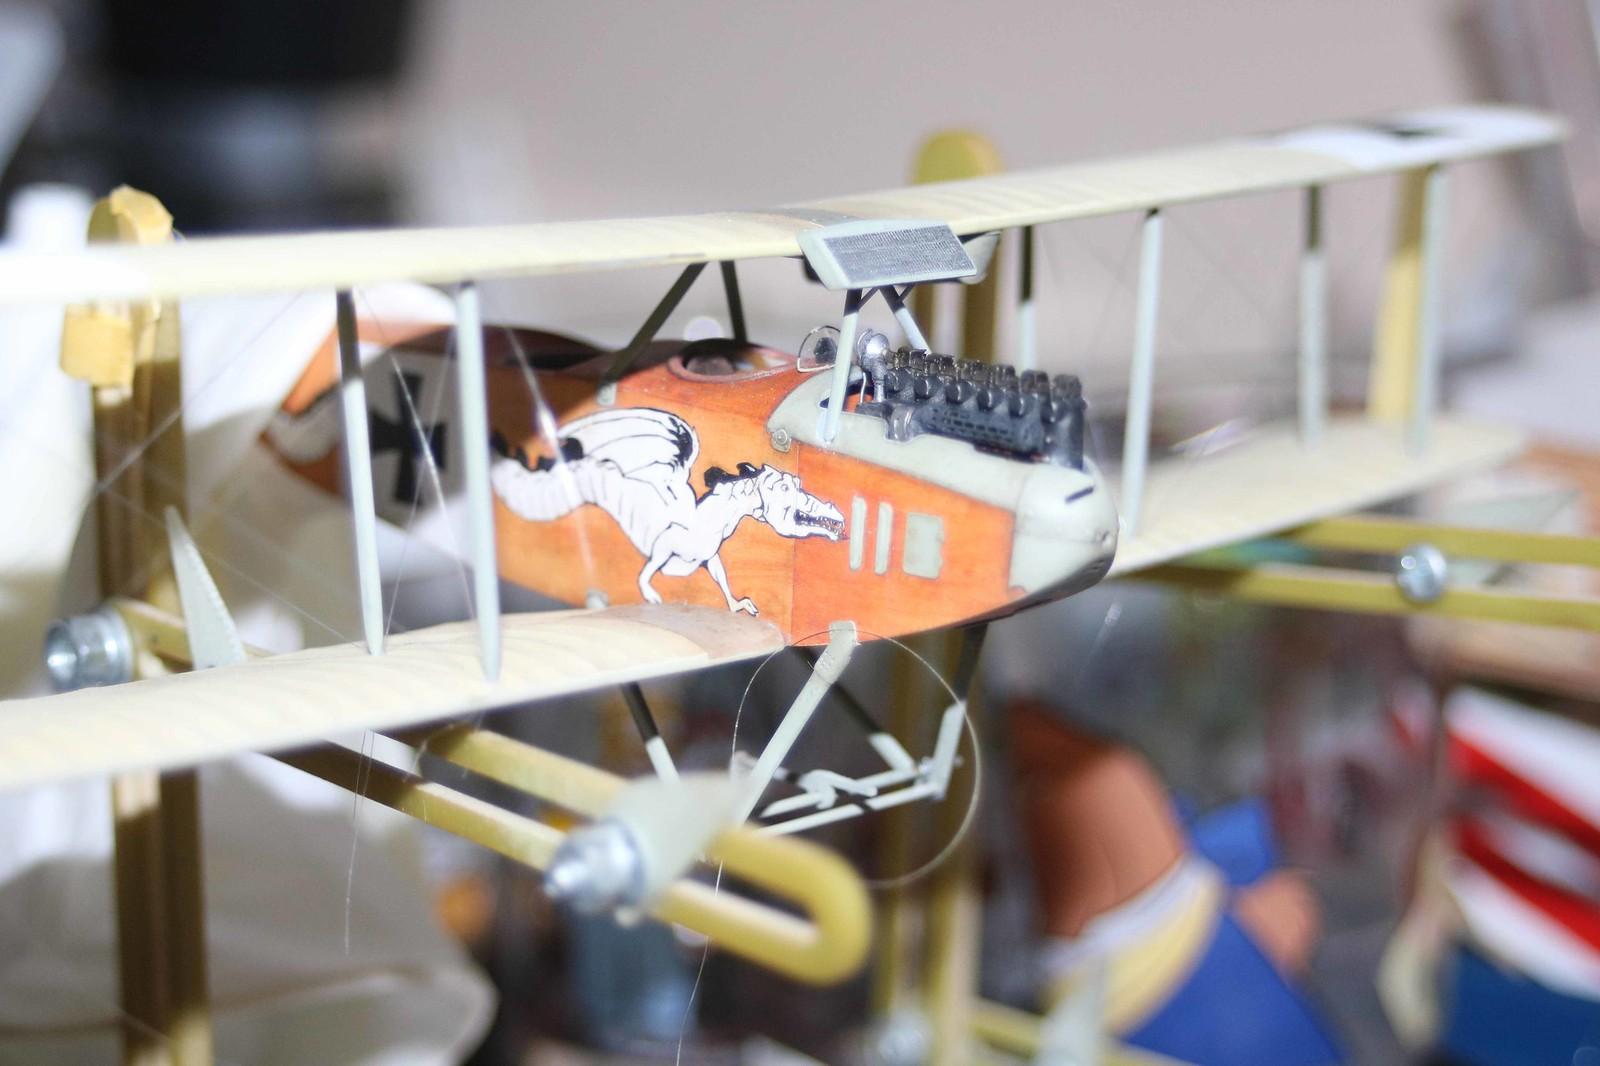 1/48 Albatros C. III   Crocodile et Dragon - Page 2 32336329198_cf0db061f2_h